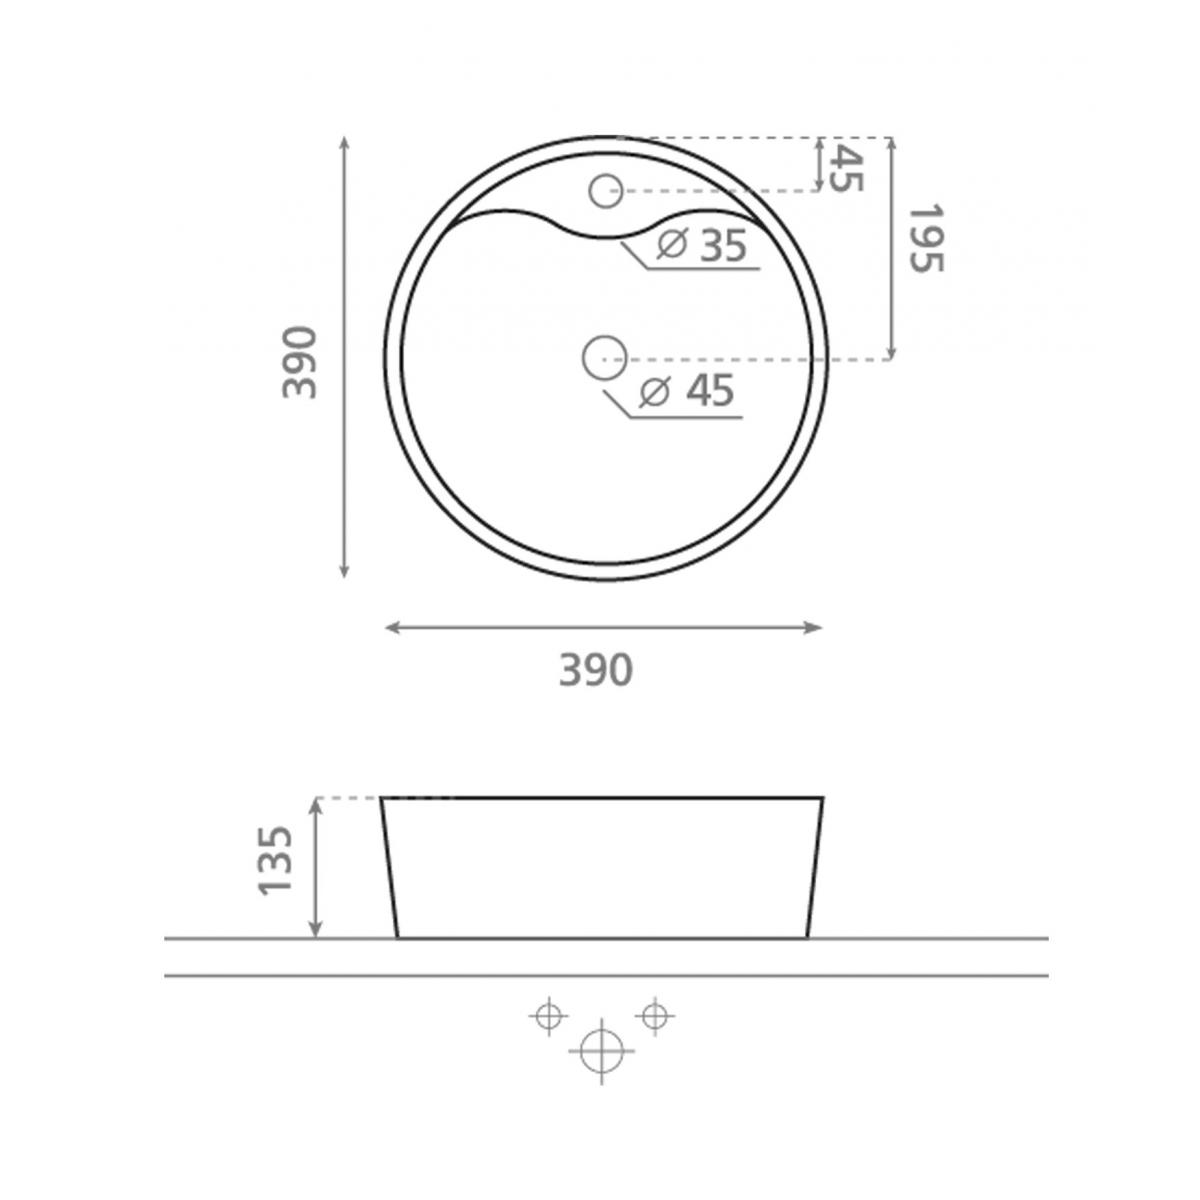 Lavabo Circular Viena - Lavabos circulares - Marca The Bathco